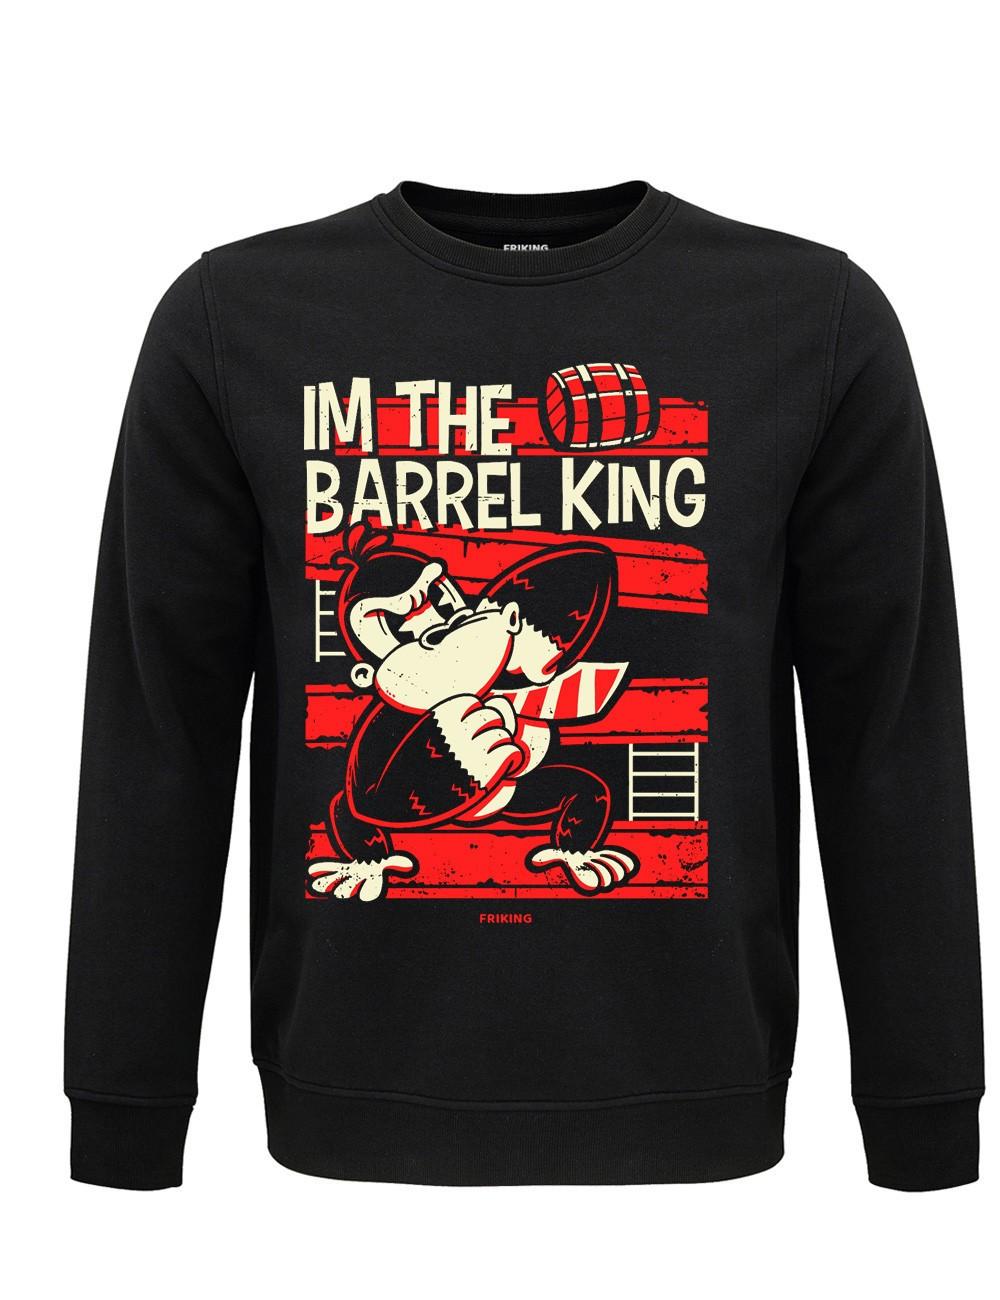 Im the barrel king